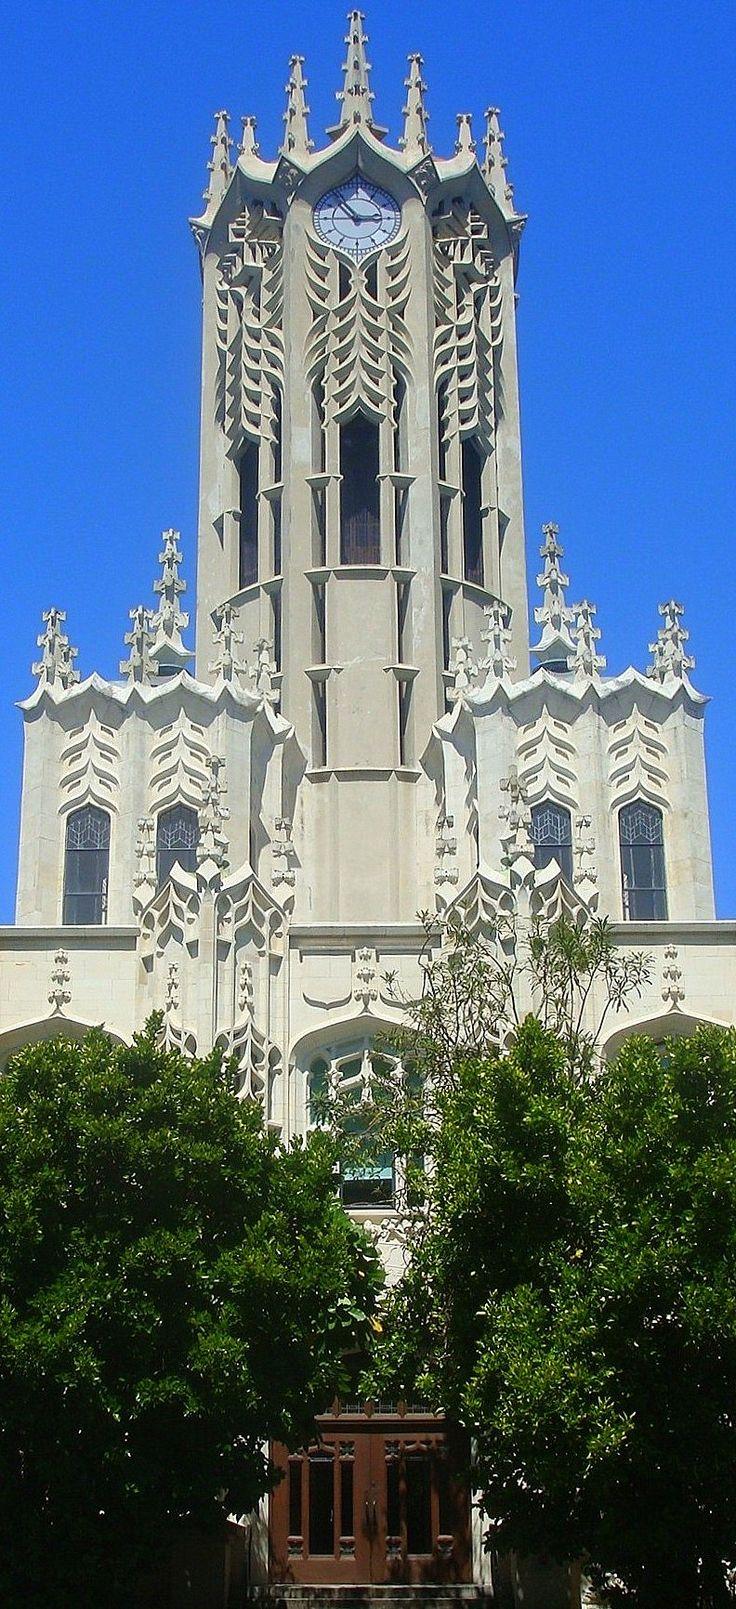 Clock tower. The University of Auckland - Te Whare Wānanga o Tāmaki Makaurau -  largest university in NEW ZEALAND